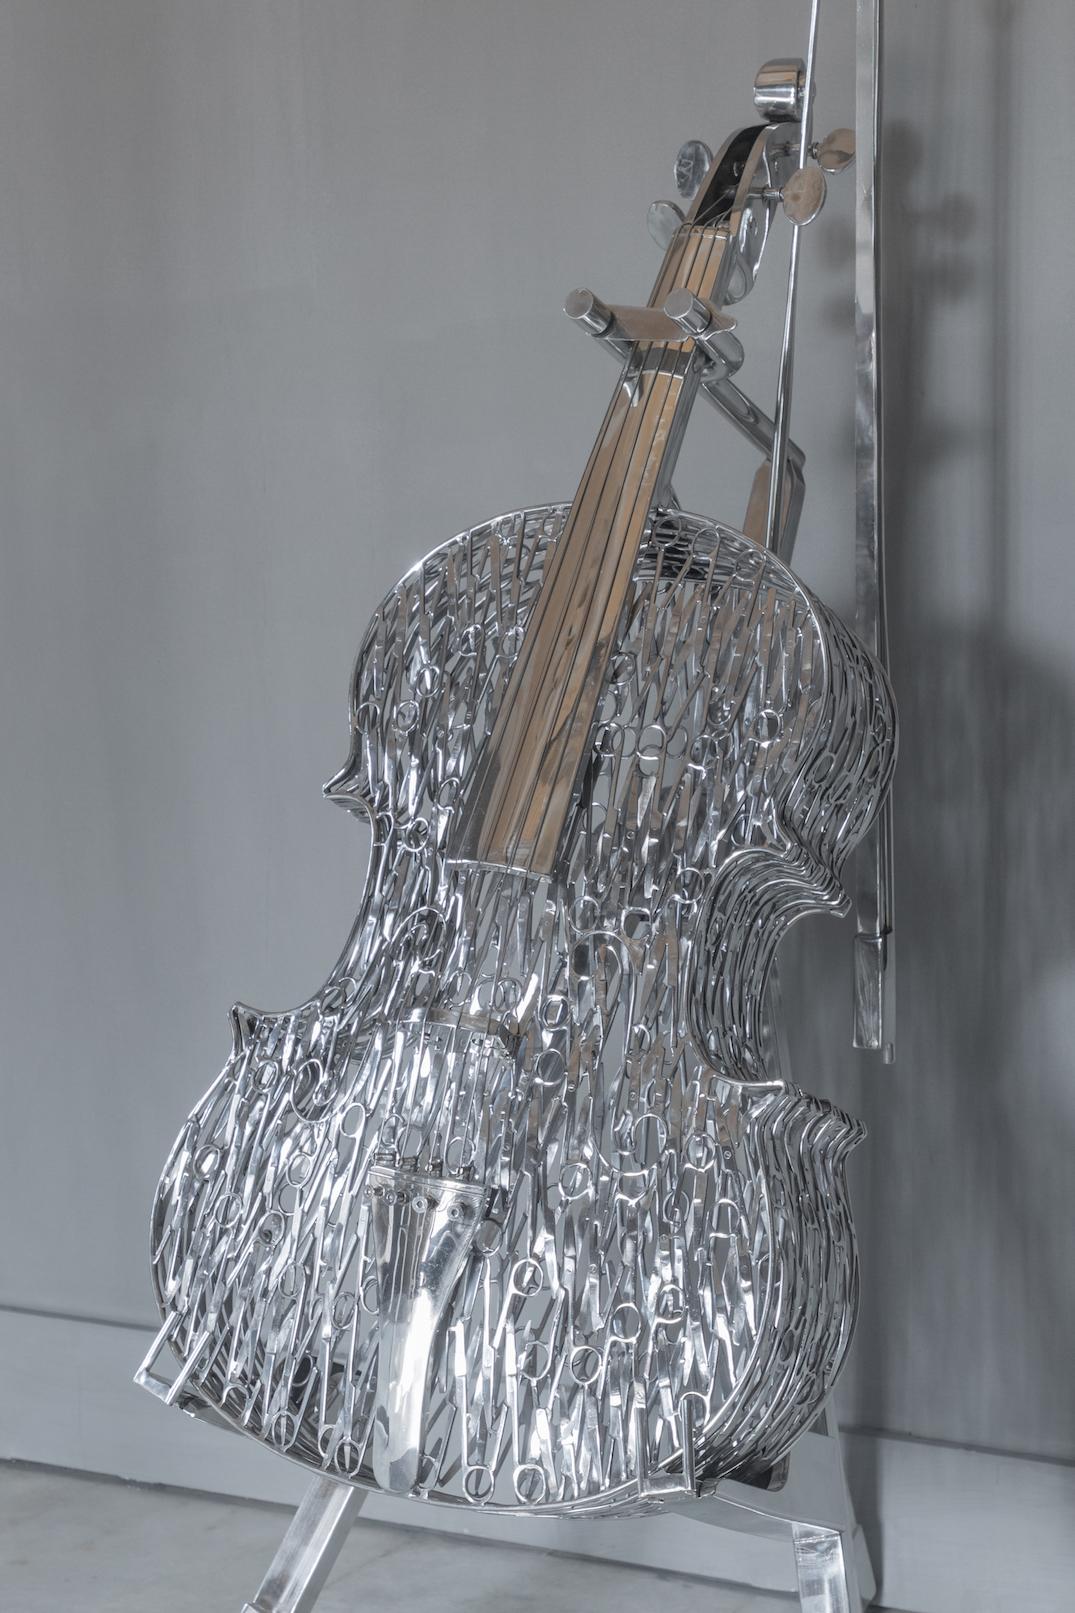 Mahbubur Rahmna, Surgical scissors, sculpture